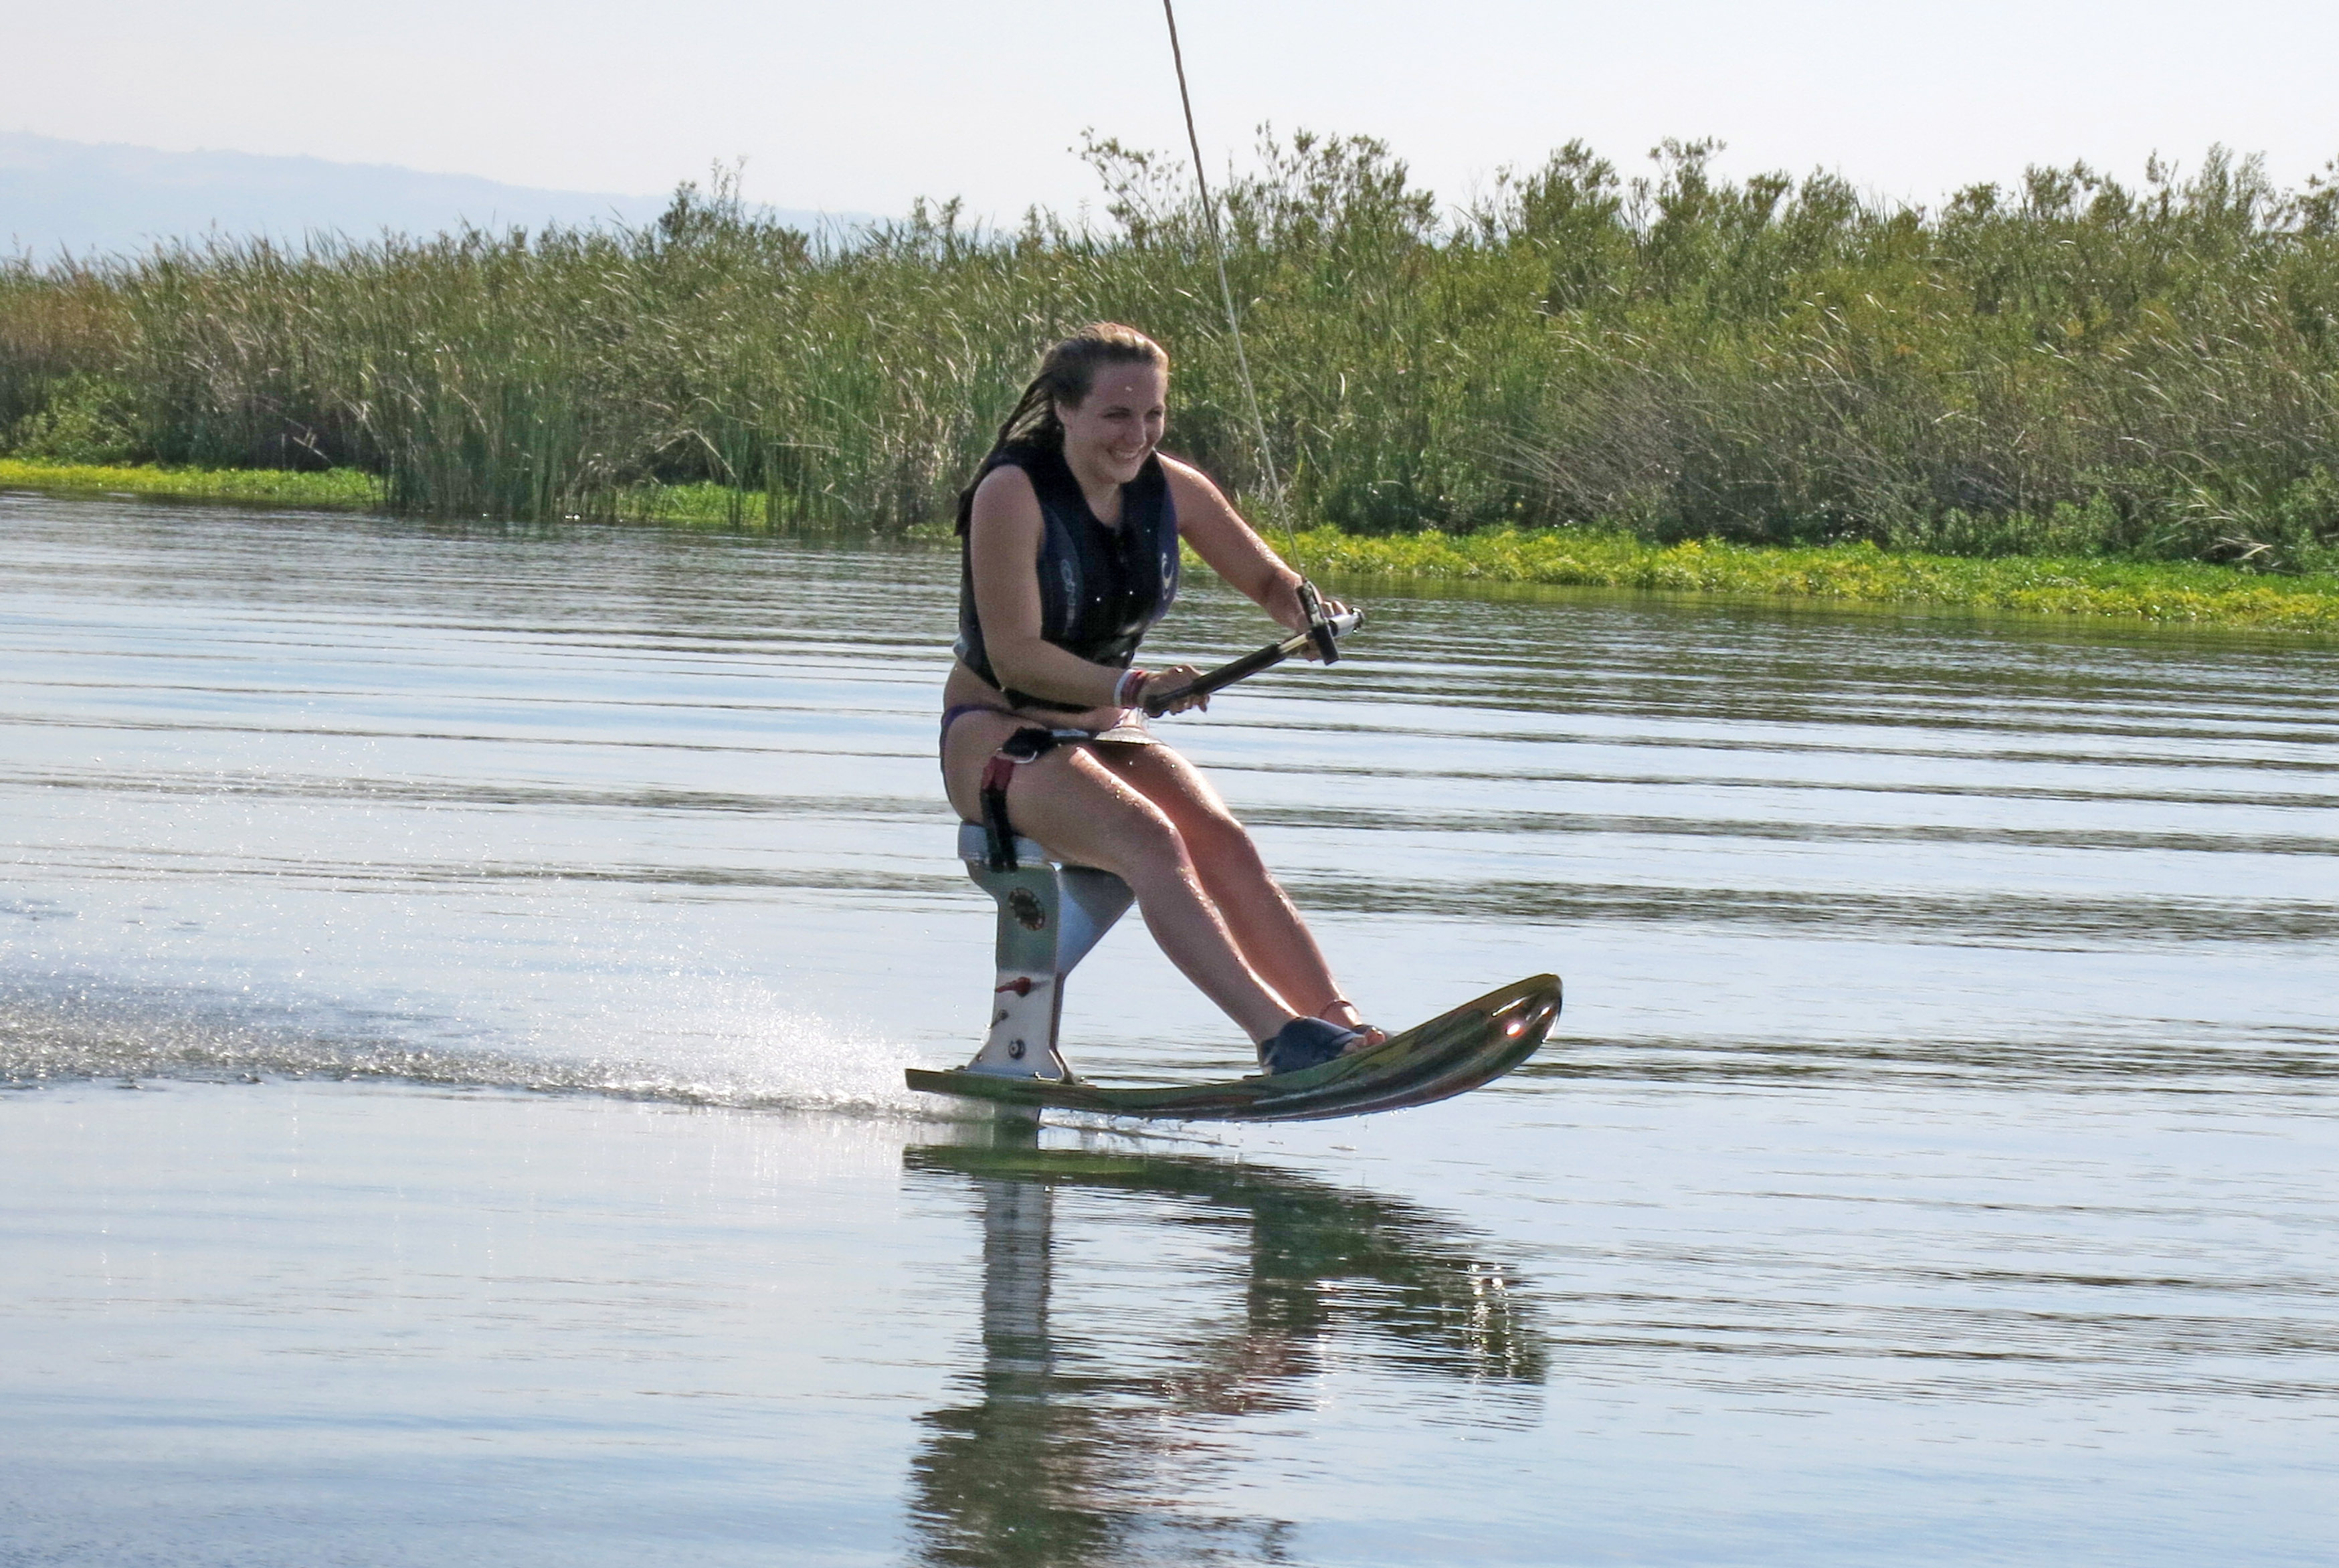 2013 Jetski And Delta Boating Day